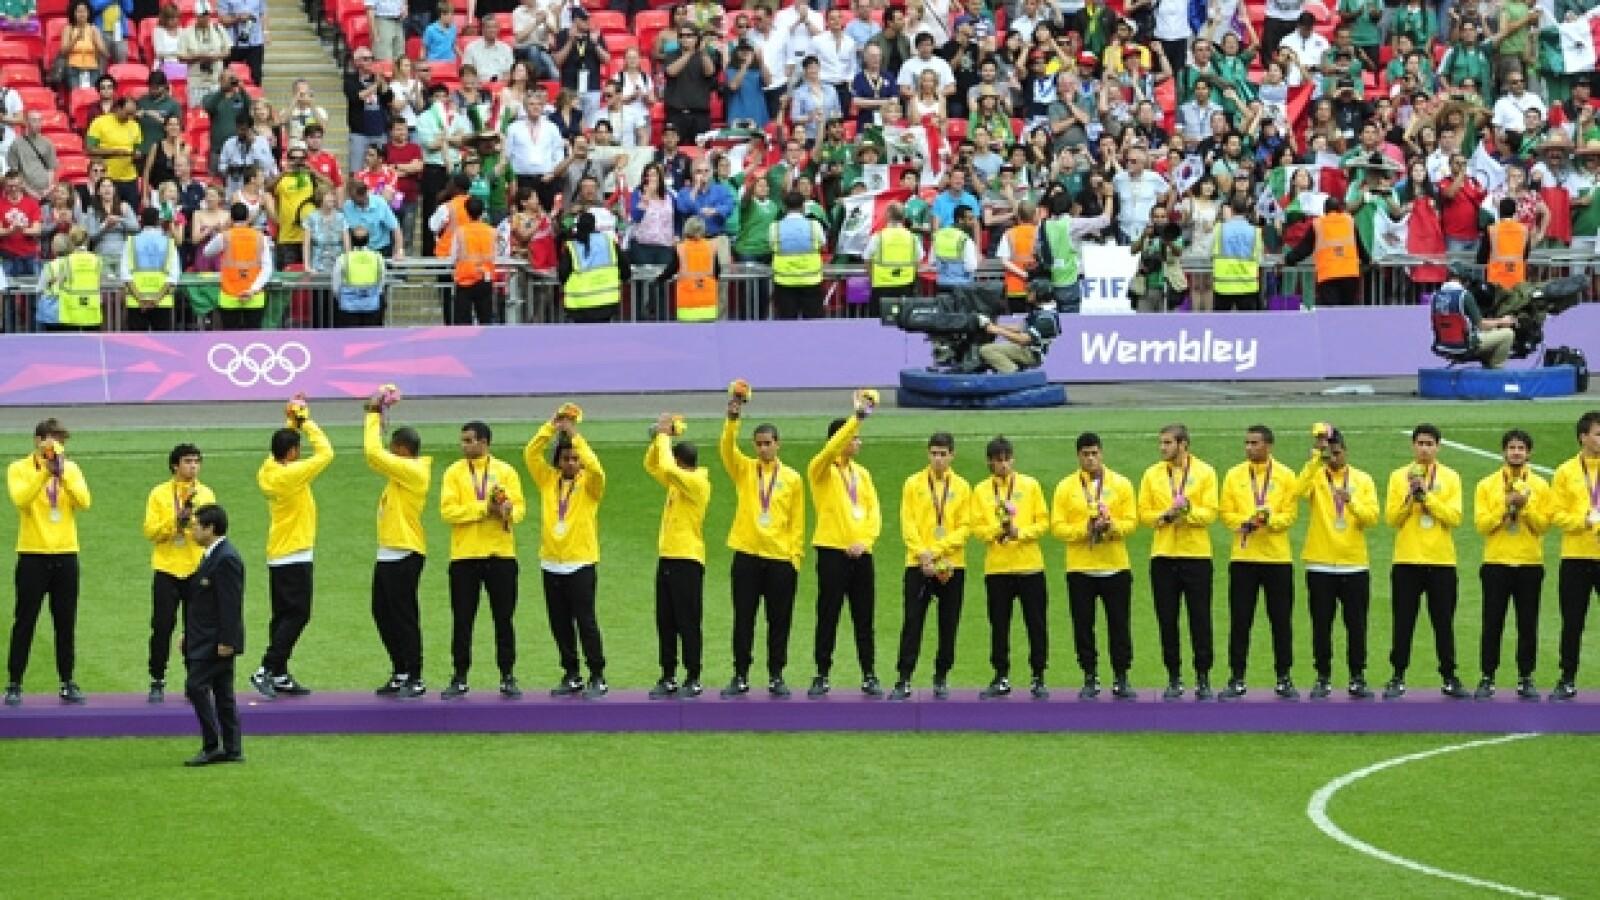 brasil plata medalla londres